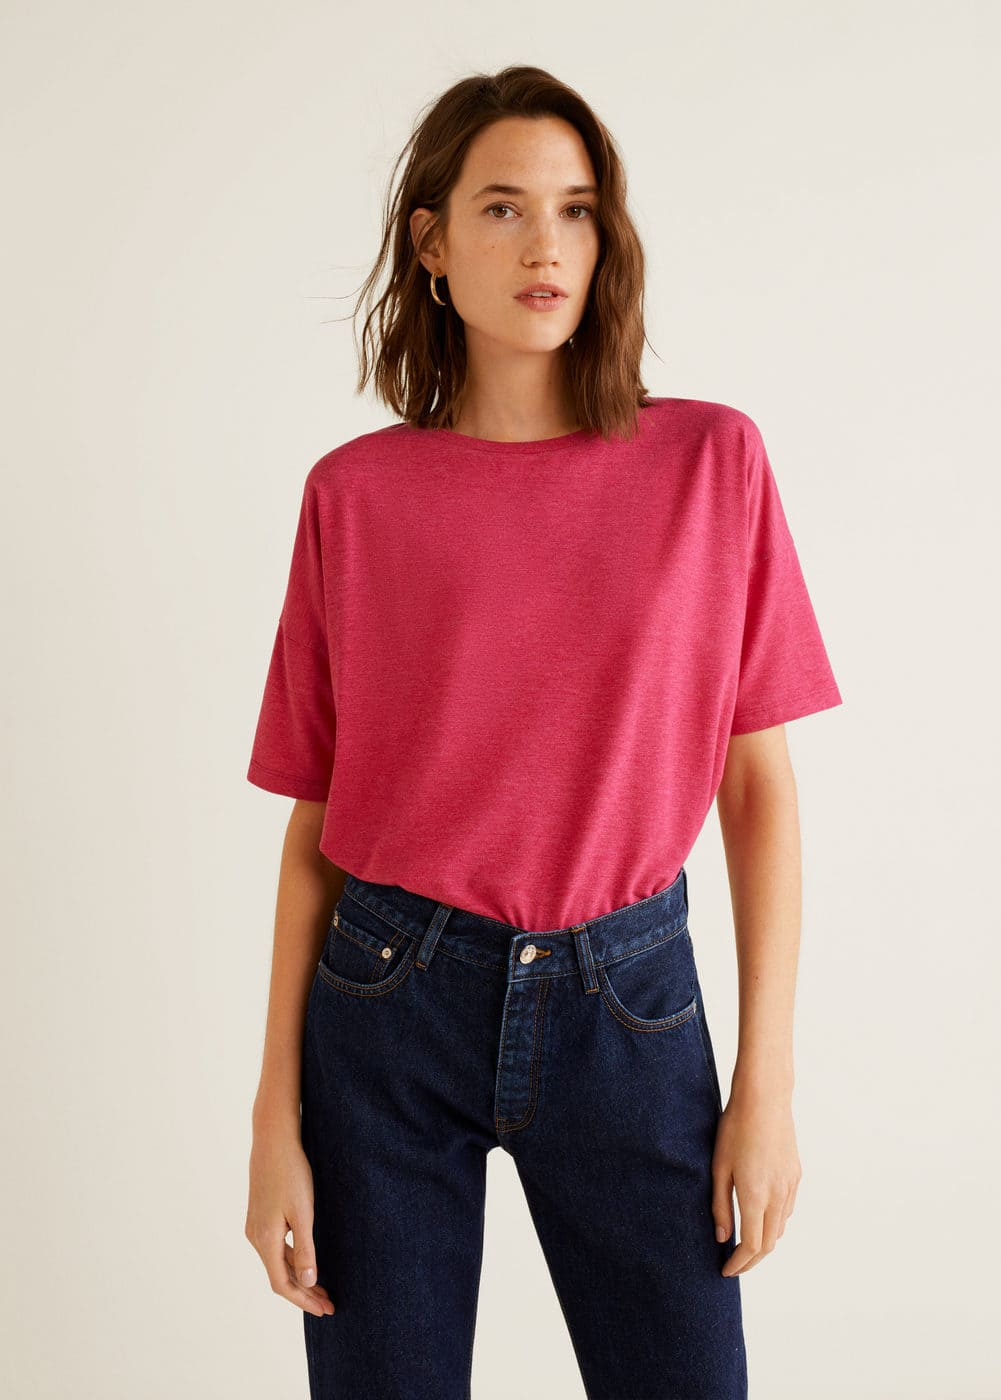 Mango - Basic t-shirt - 1